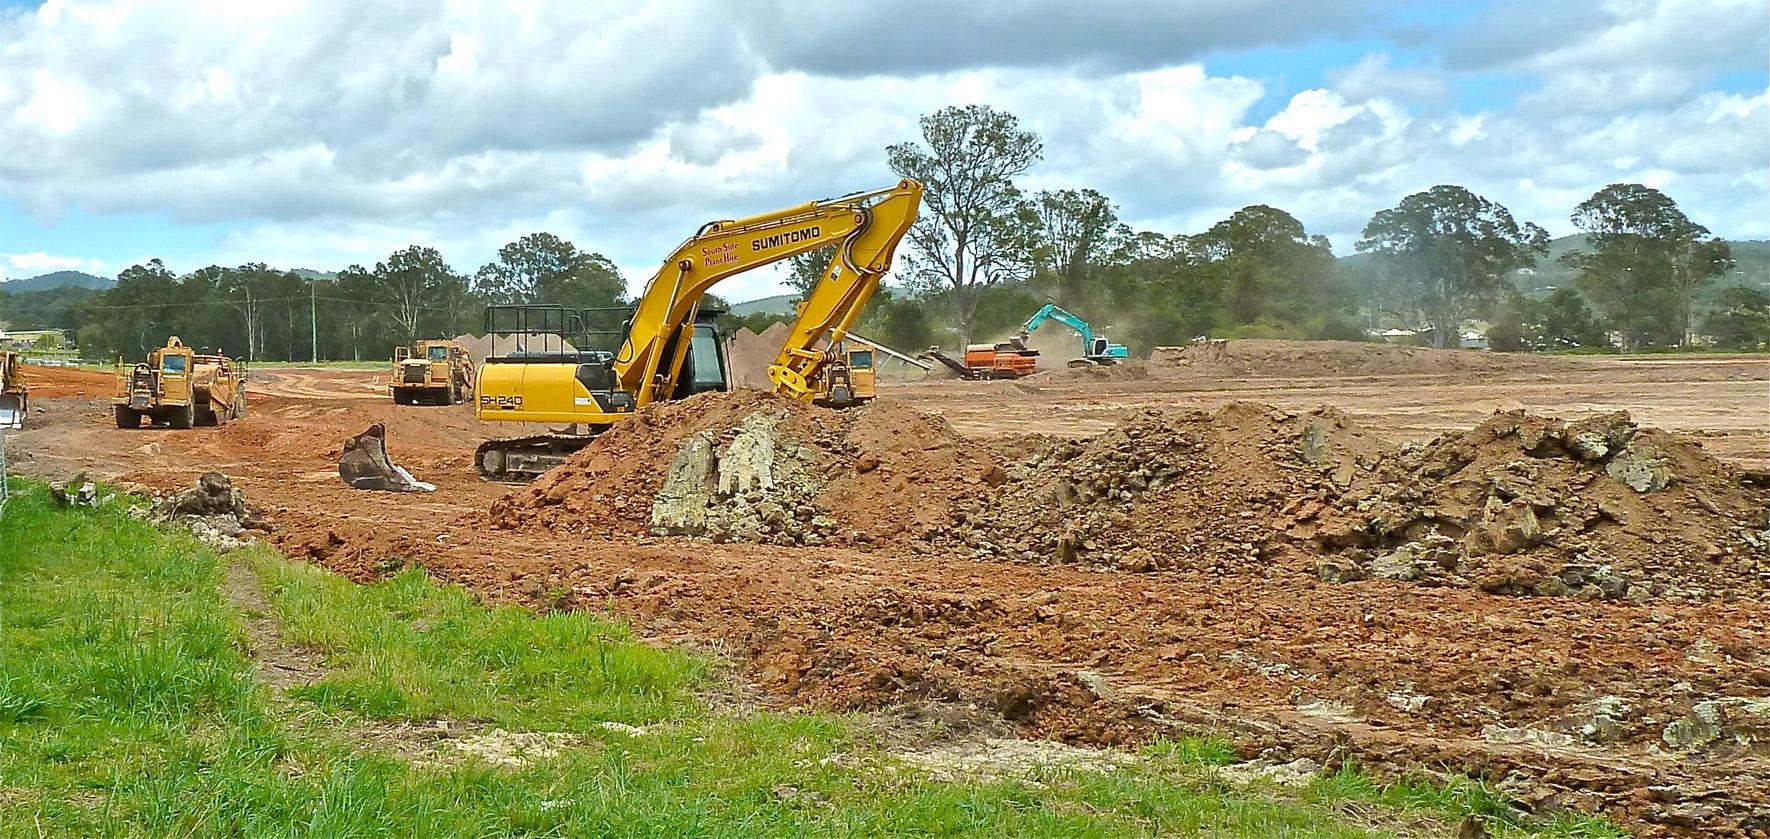 bulldozer-410120